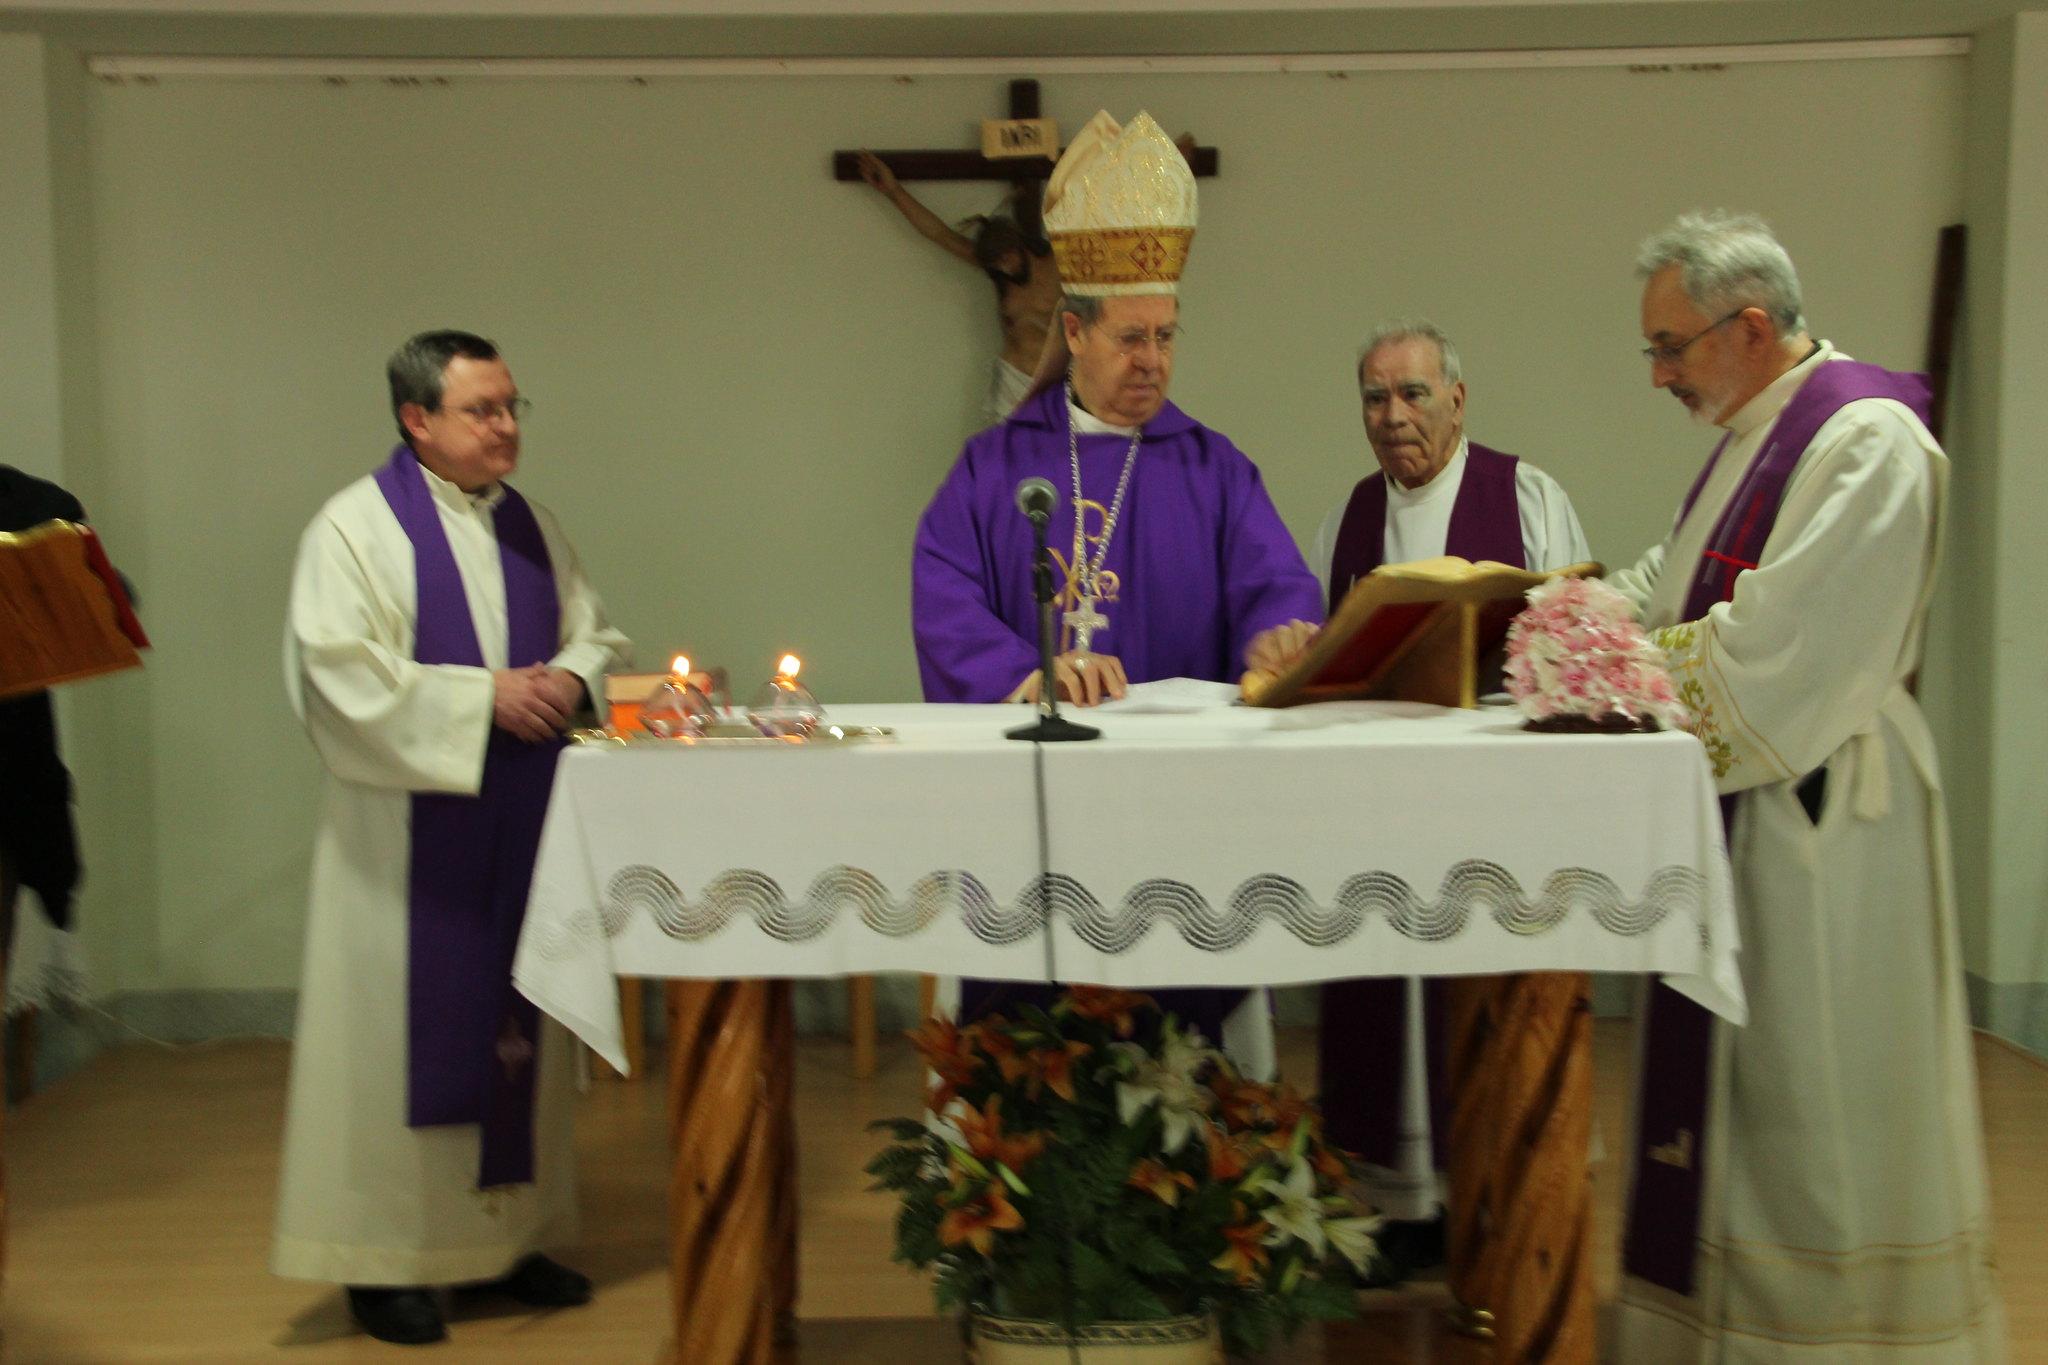 (2016-02-13) - Inauguración Virgen De Lourdes, La Molineta - Archivo La Molineta (001)